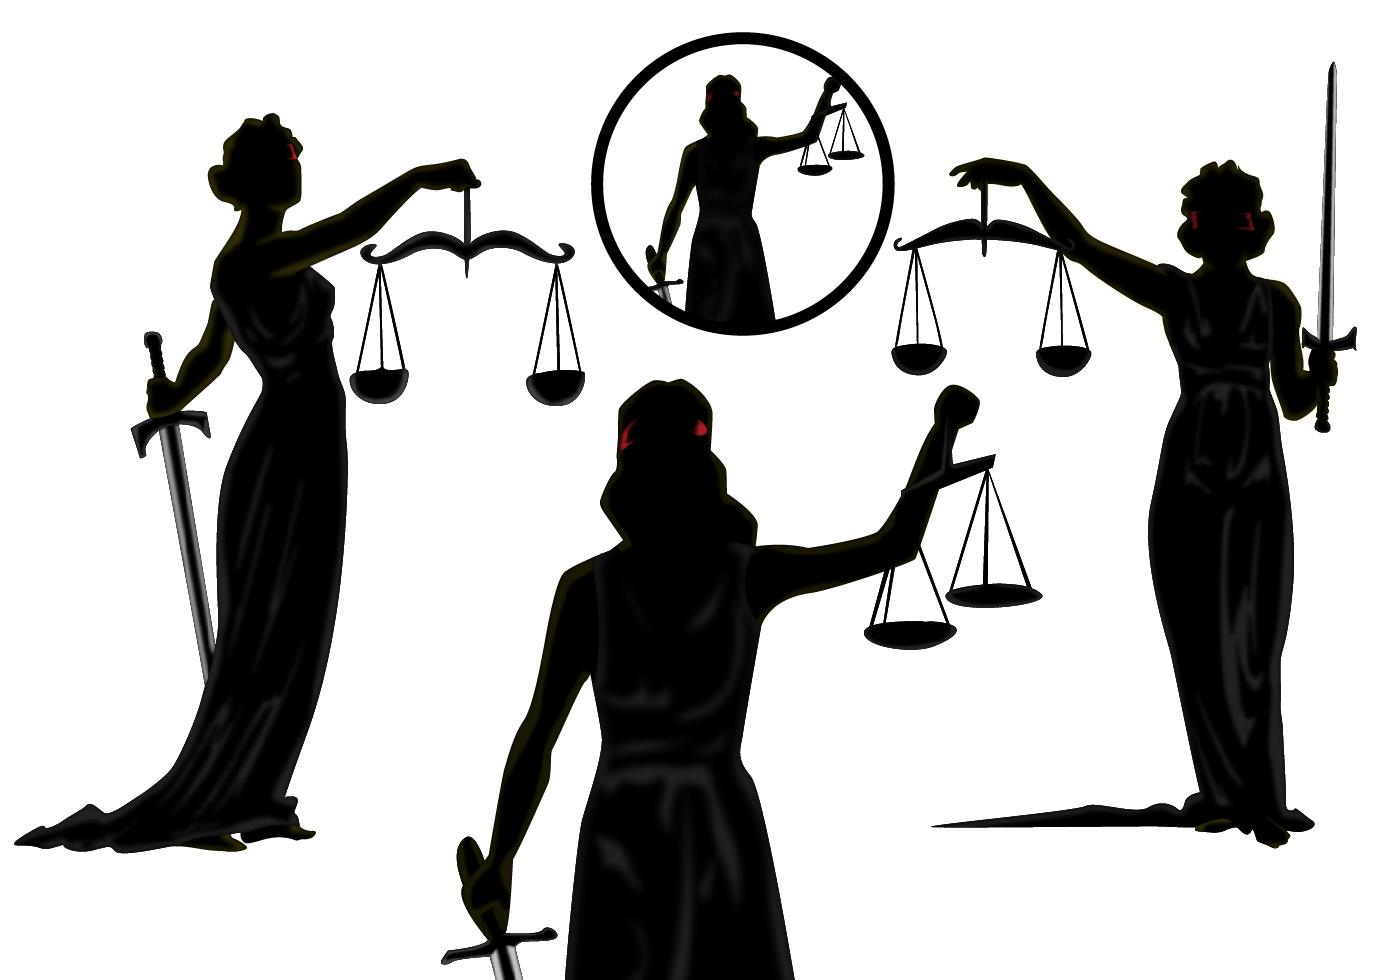 lady justice vectors download free vector art  stock Gavel Clip Art Law and Justice Clip Art